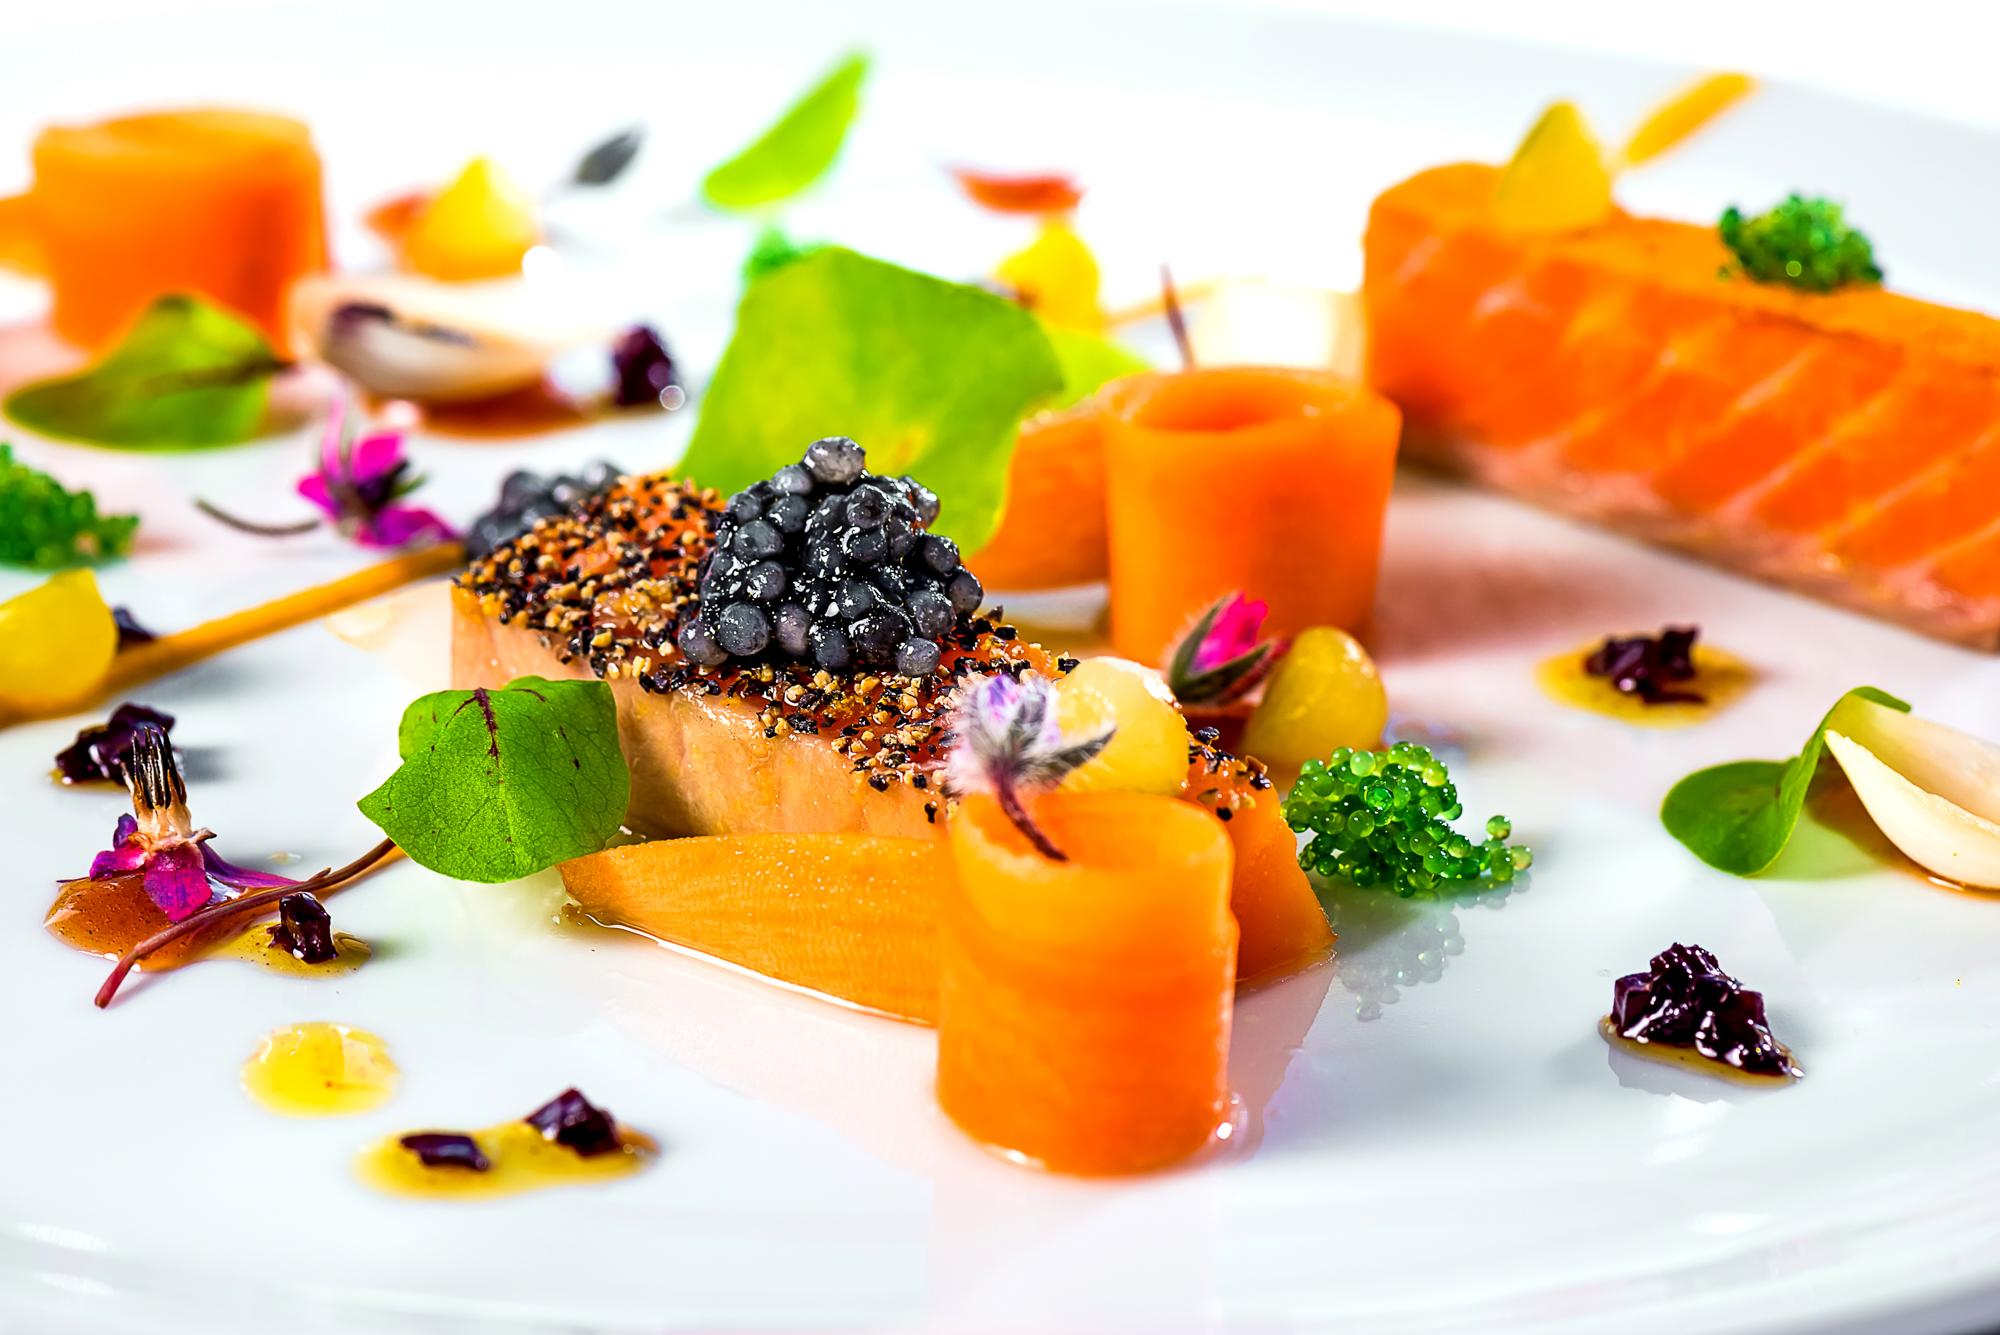 Tumeric-Cured-Salmon-Mulranny-Park-Hotel-Food-Photography-2.jpg